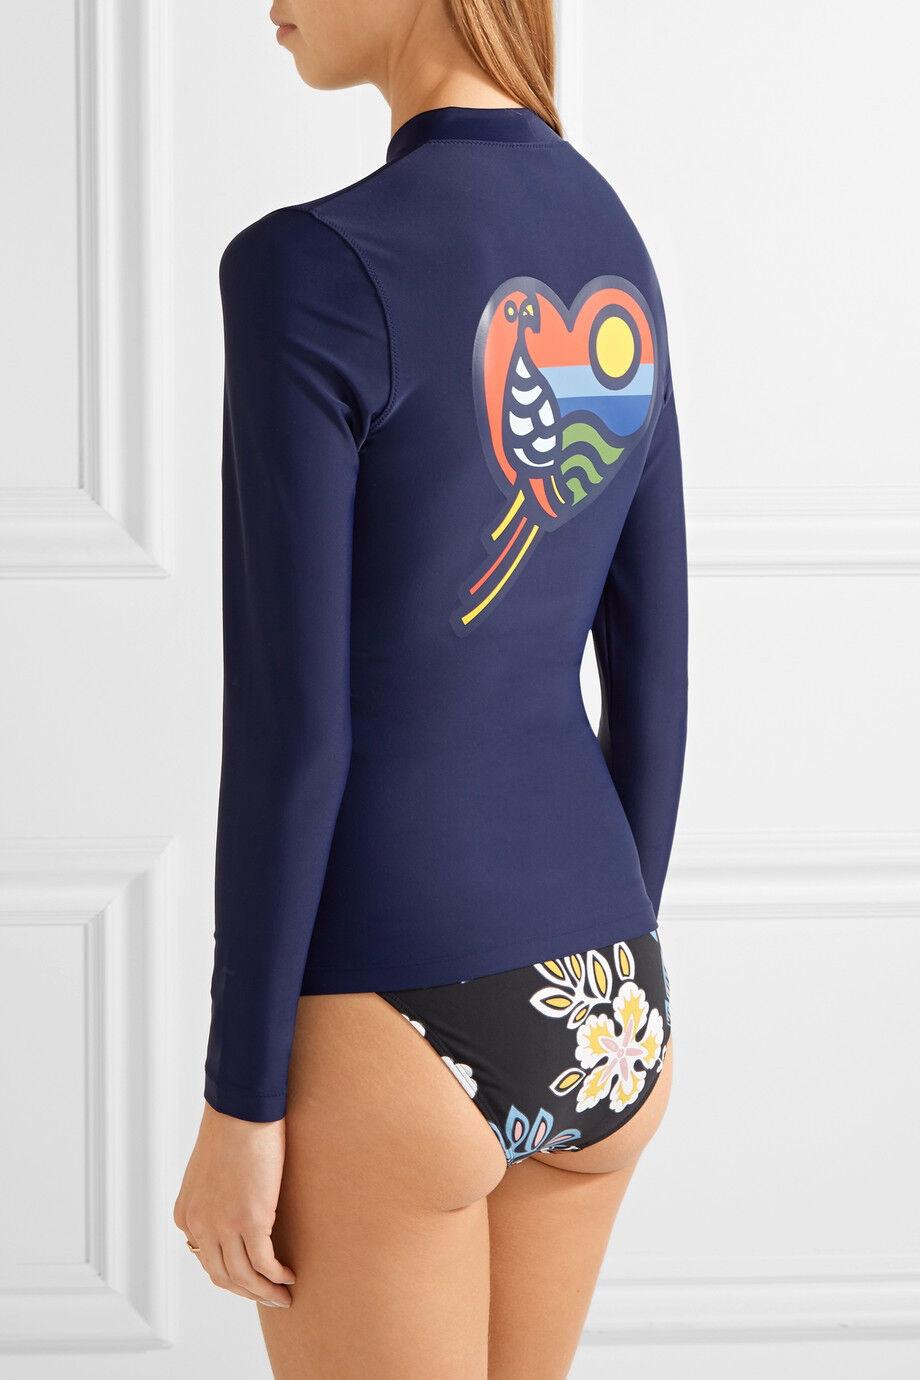 Tory Burch Navy Surf Shirt bluee  NWT Swim S Beach rashguard  198 Macaw